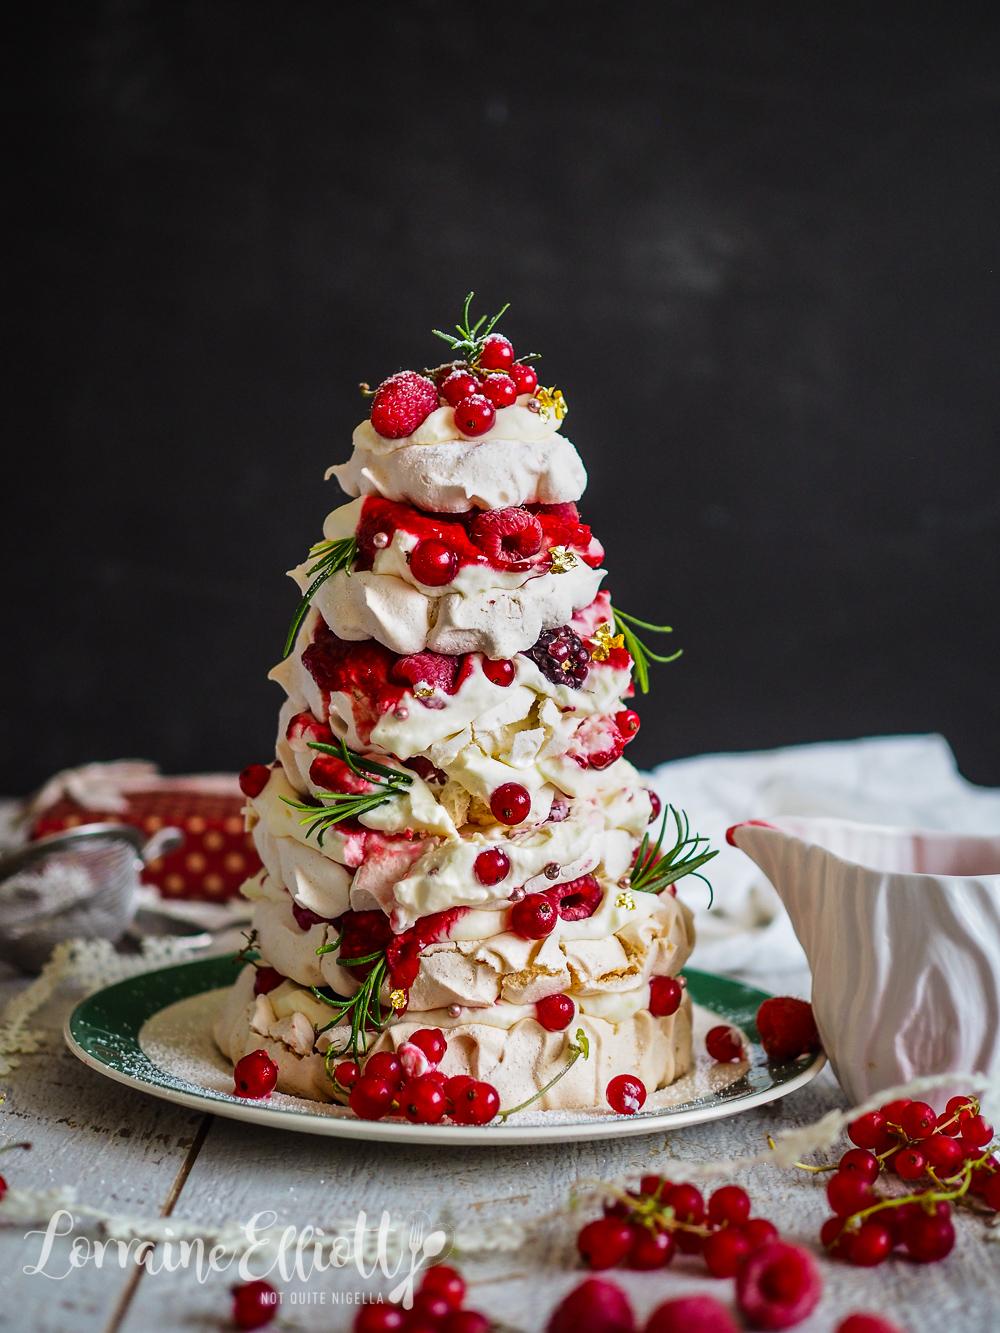 Top 5 Christmas Cakes